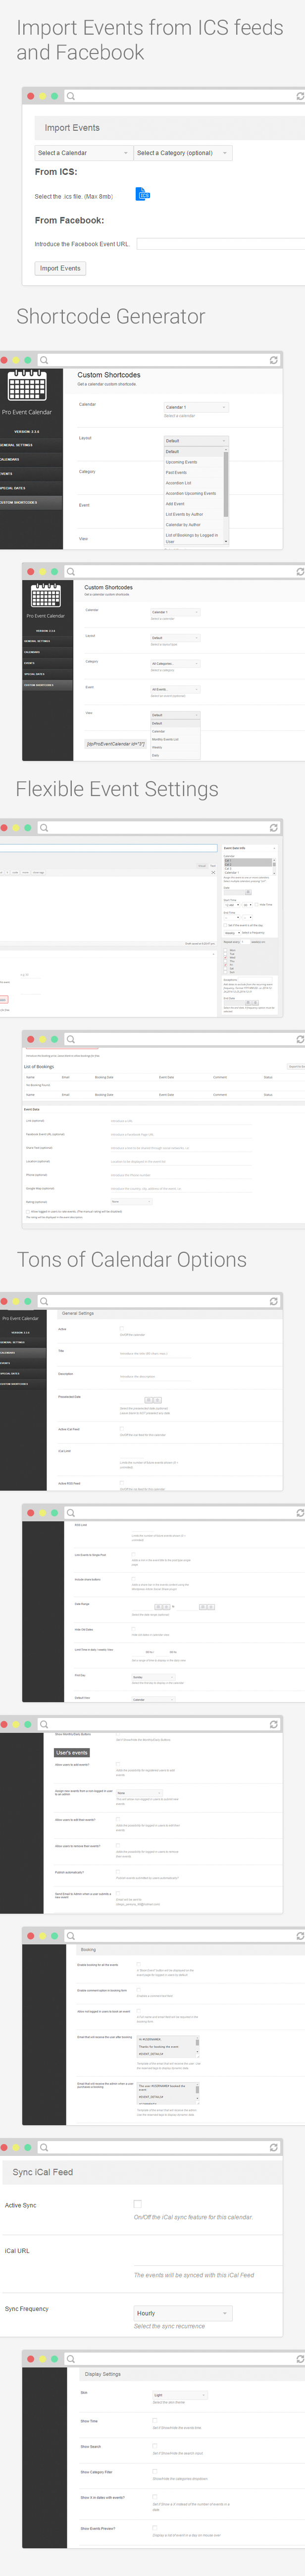 WordPress Pro Event Calendar - 2